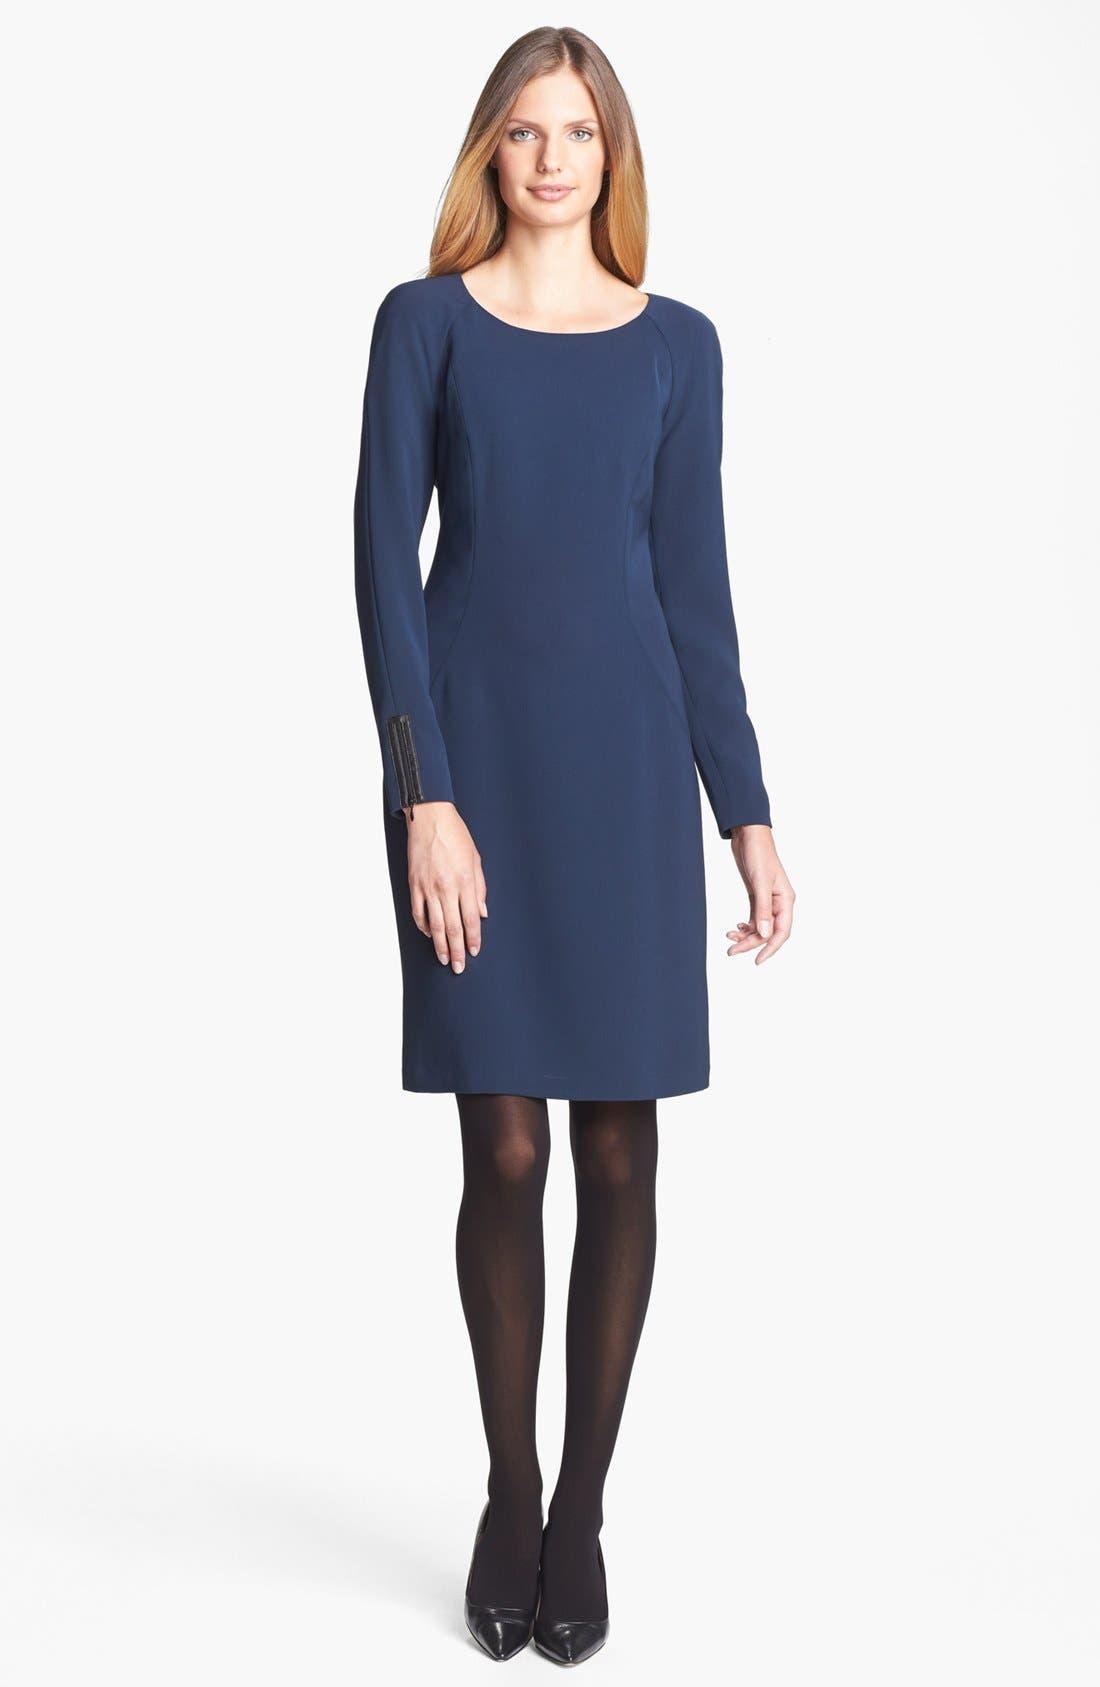 Alternate Image 1 Selected - Lafayette 148 New York 'Lucida' Dress